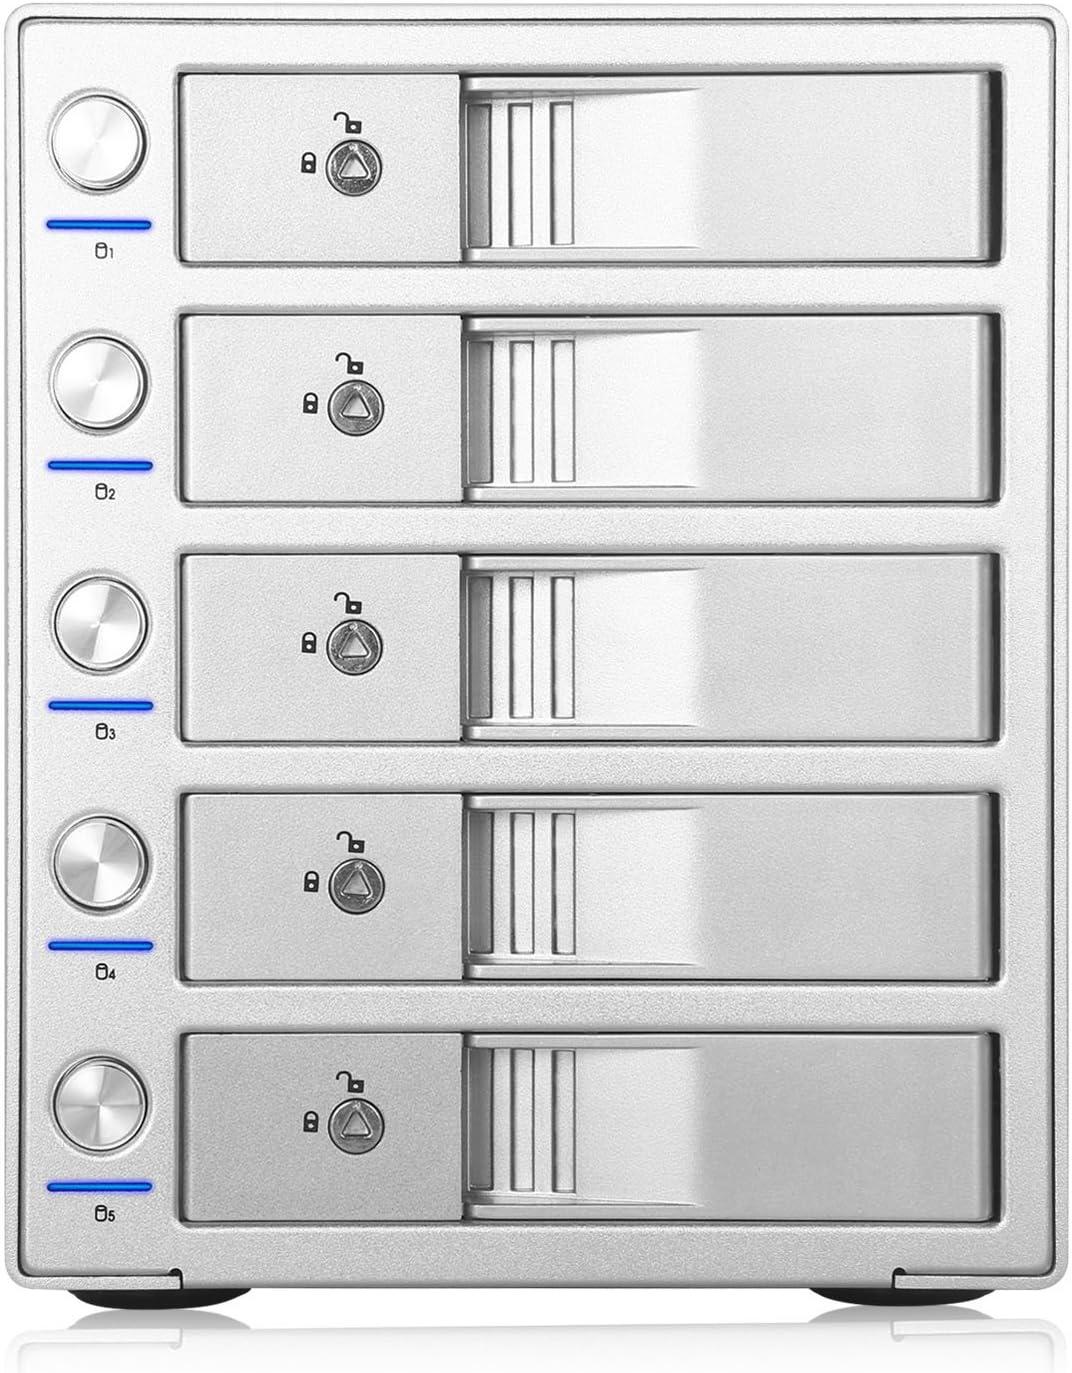 2X USB3.0 HUB SISUN 5 Bay USB 3.0 // Type C 3.5 inch SATA Hard Drive Enclosure Support 5 x 12TB HDD Enclosure Independent Control Switch